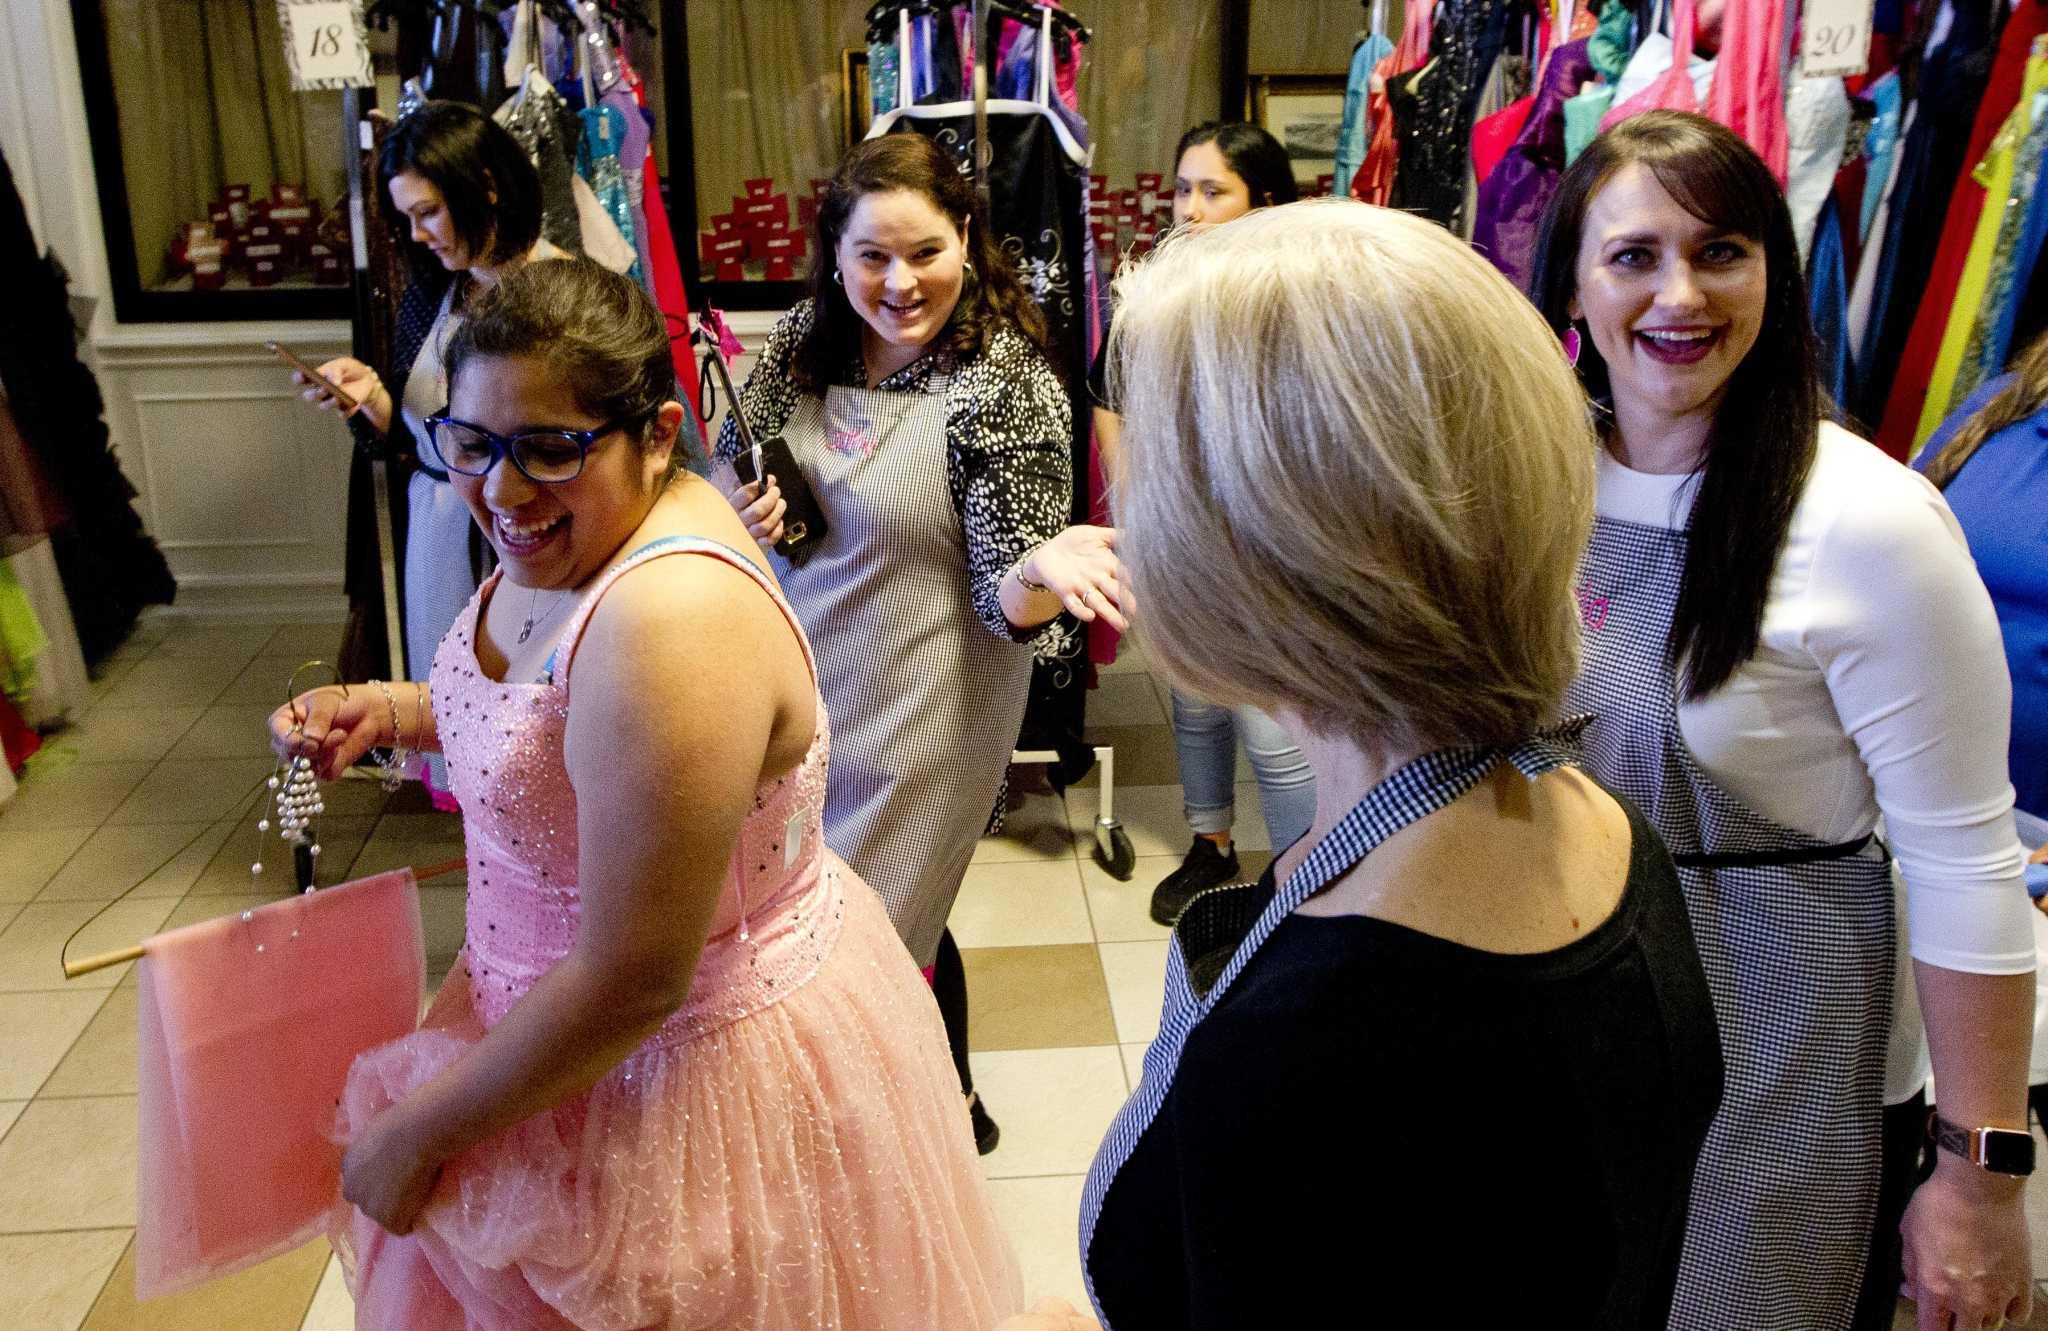 da44406e2b6 Prom Dresses North Star Mall San Antonio Tx - Gomes Weine AG